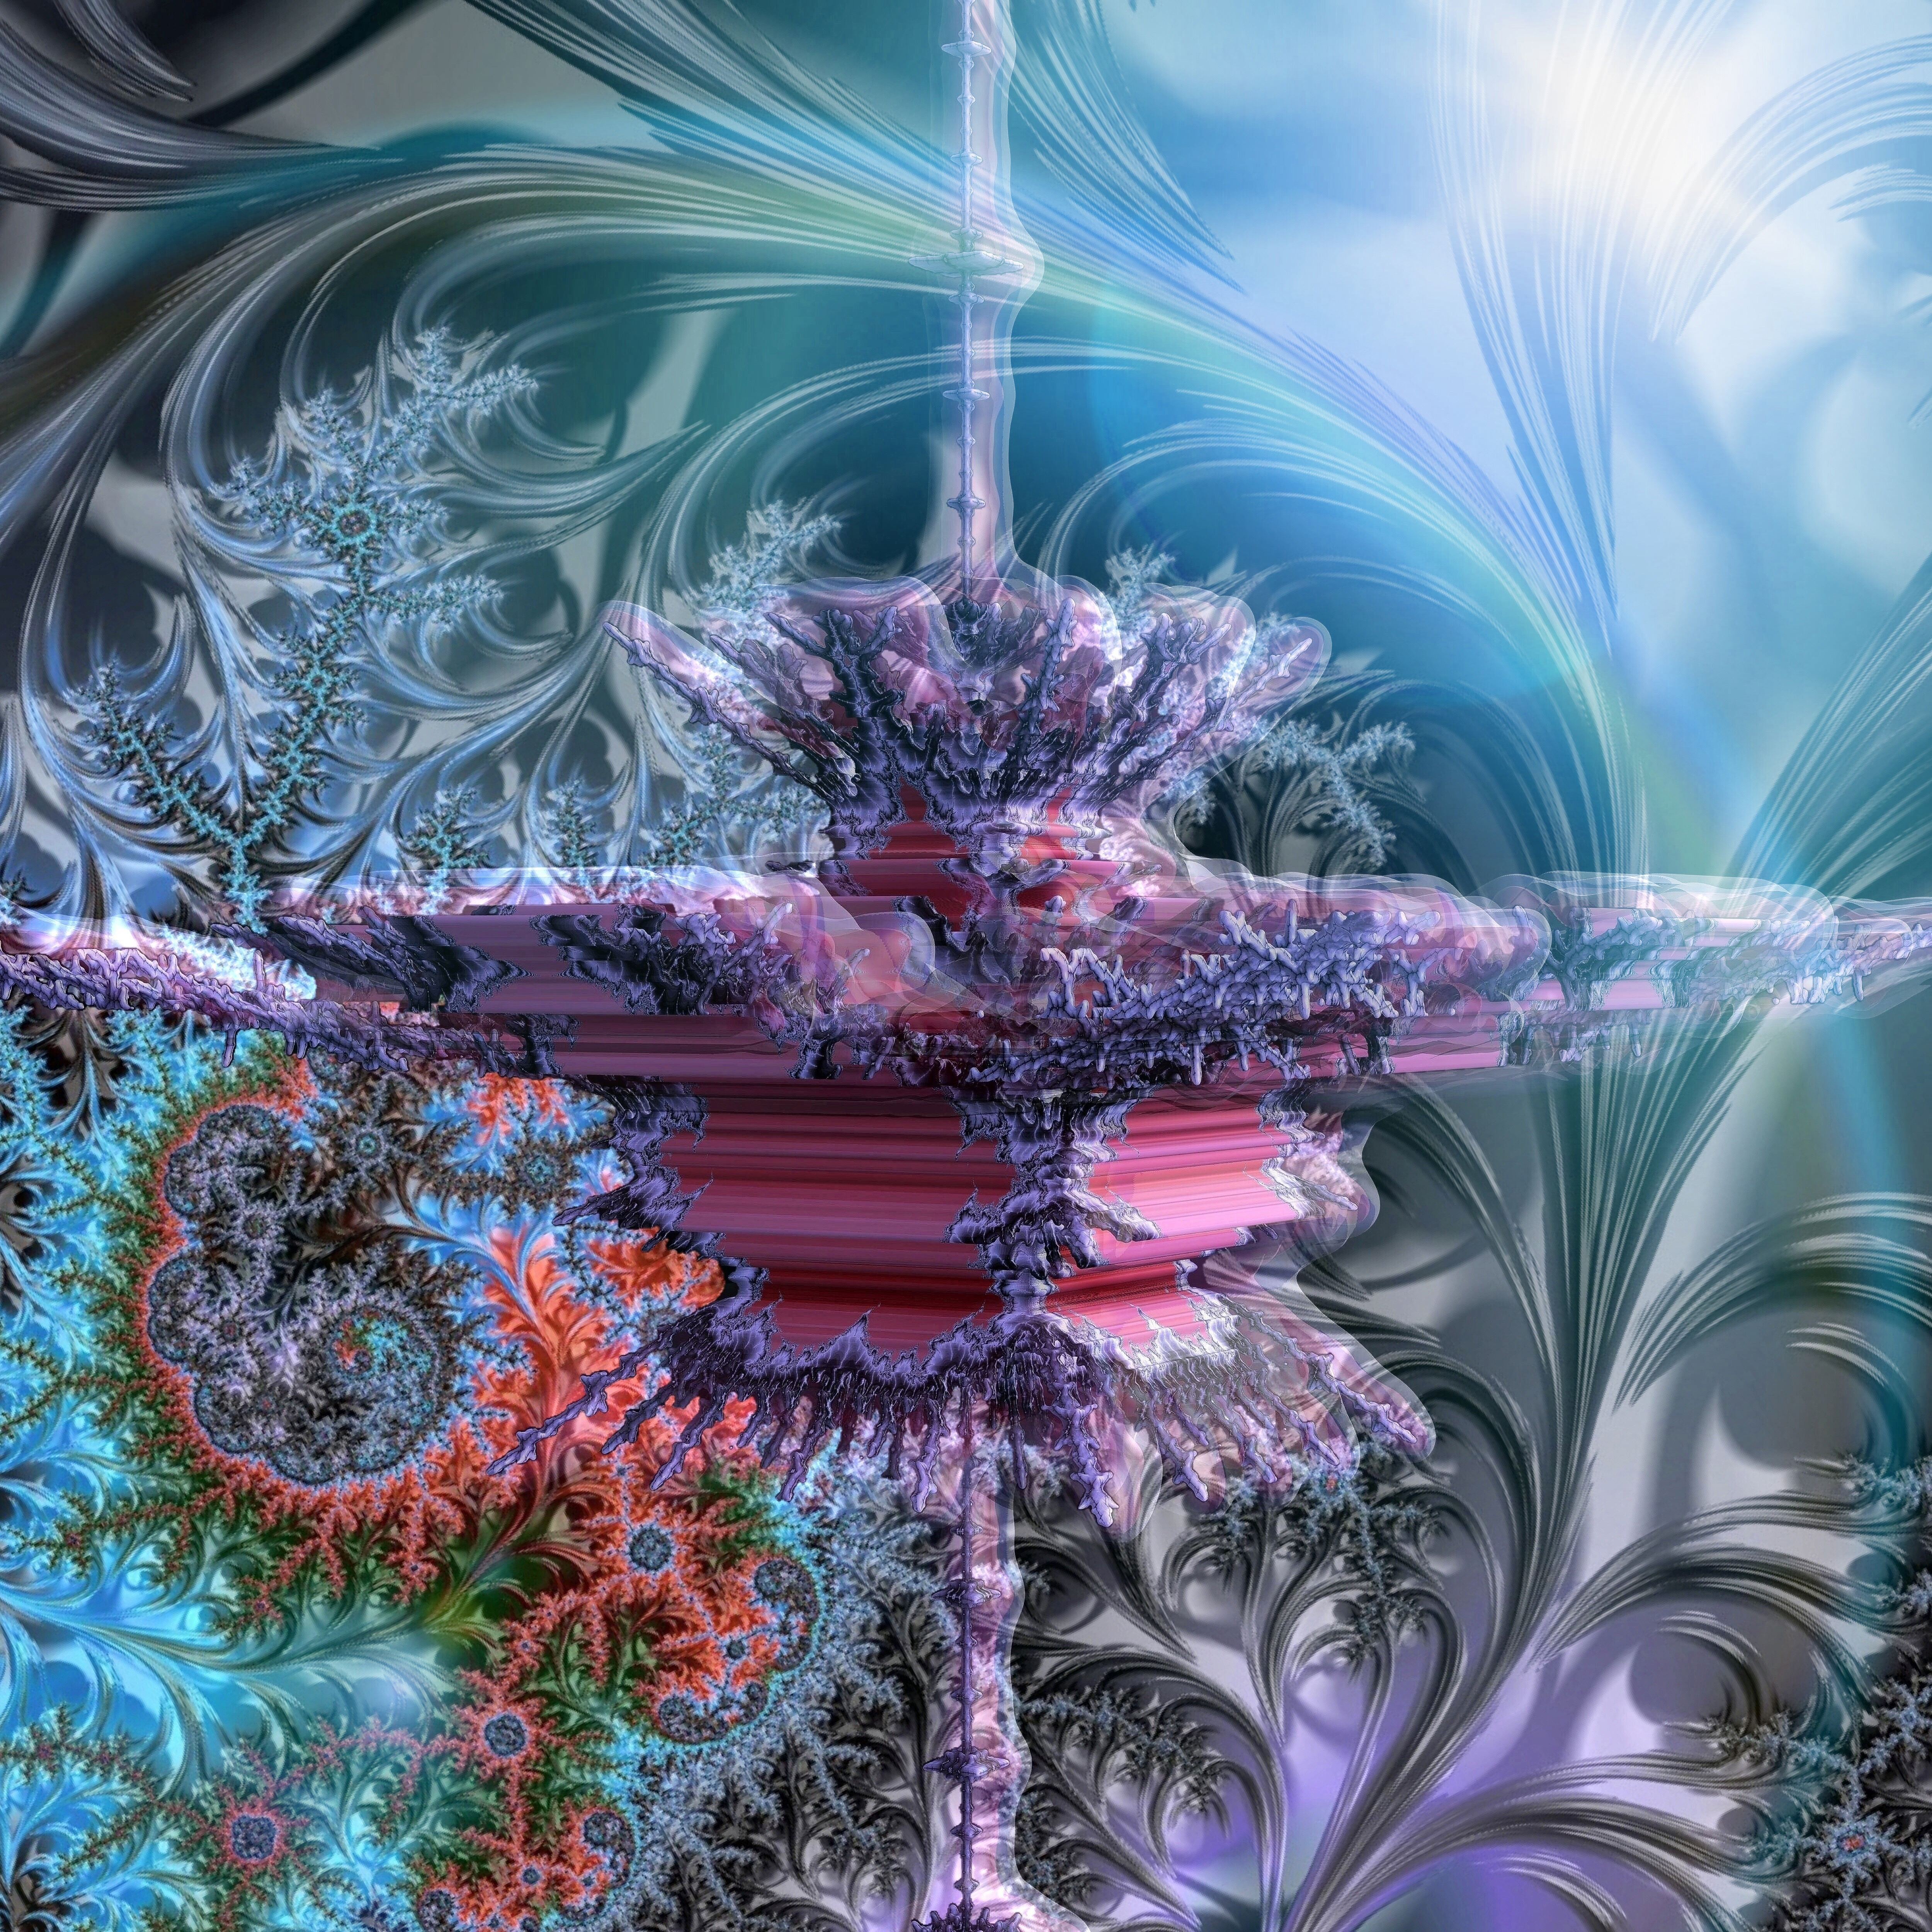 3D Mandelbrot set - Zoom in, No. 03